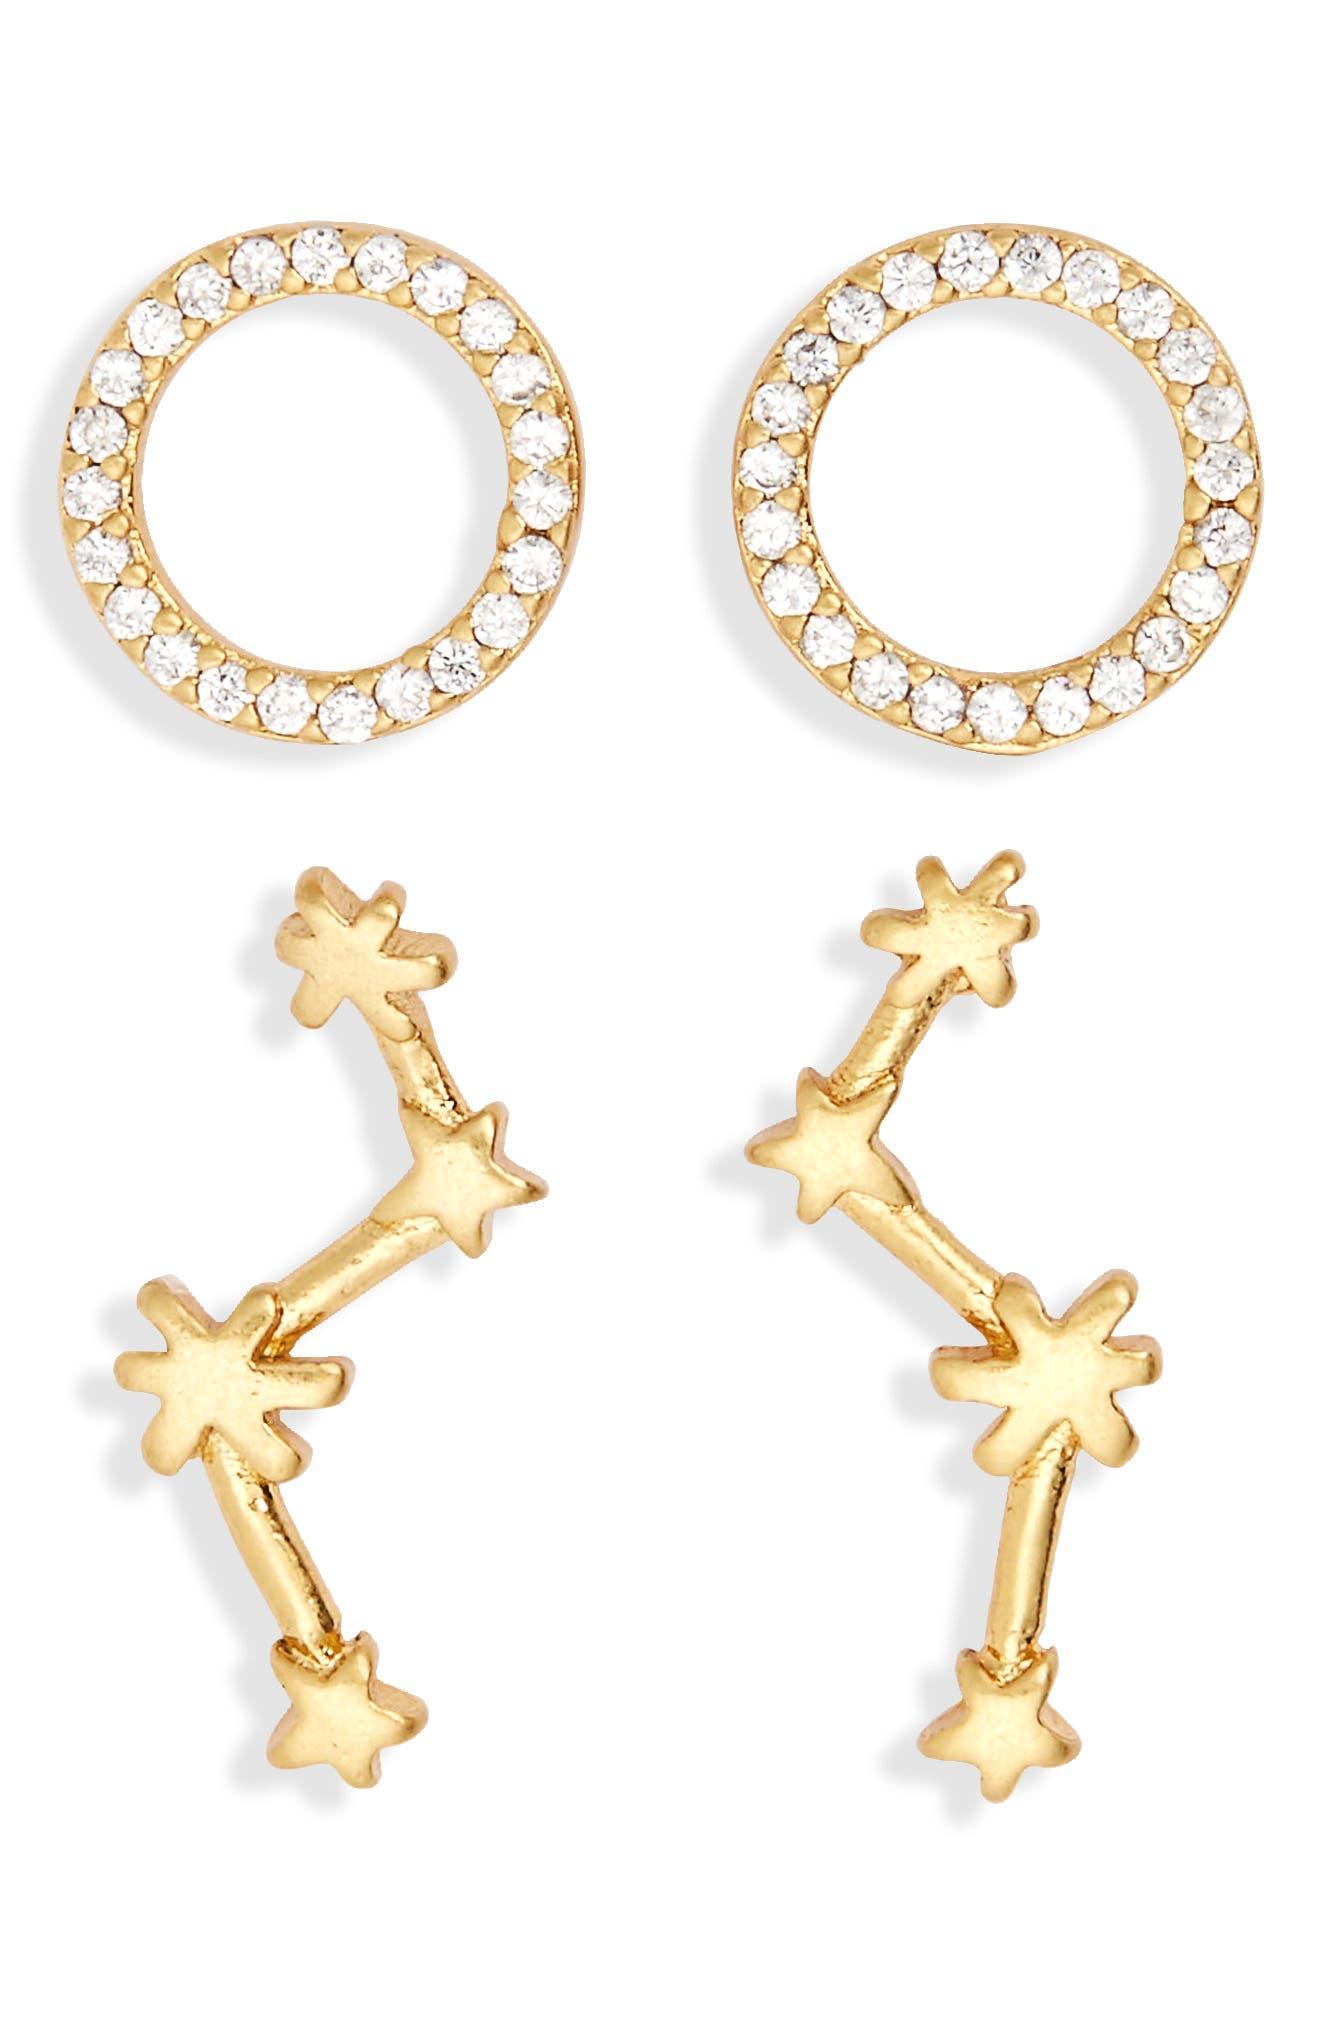 Main Image - Madewell Set of 2 Mismatched Stud Earrings